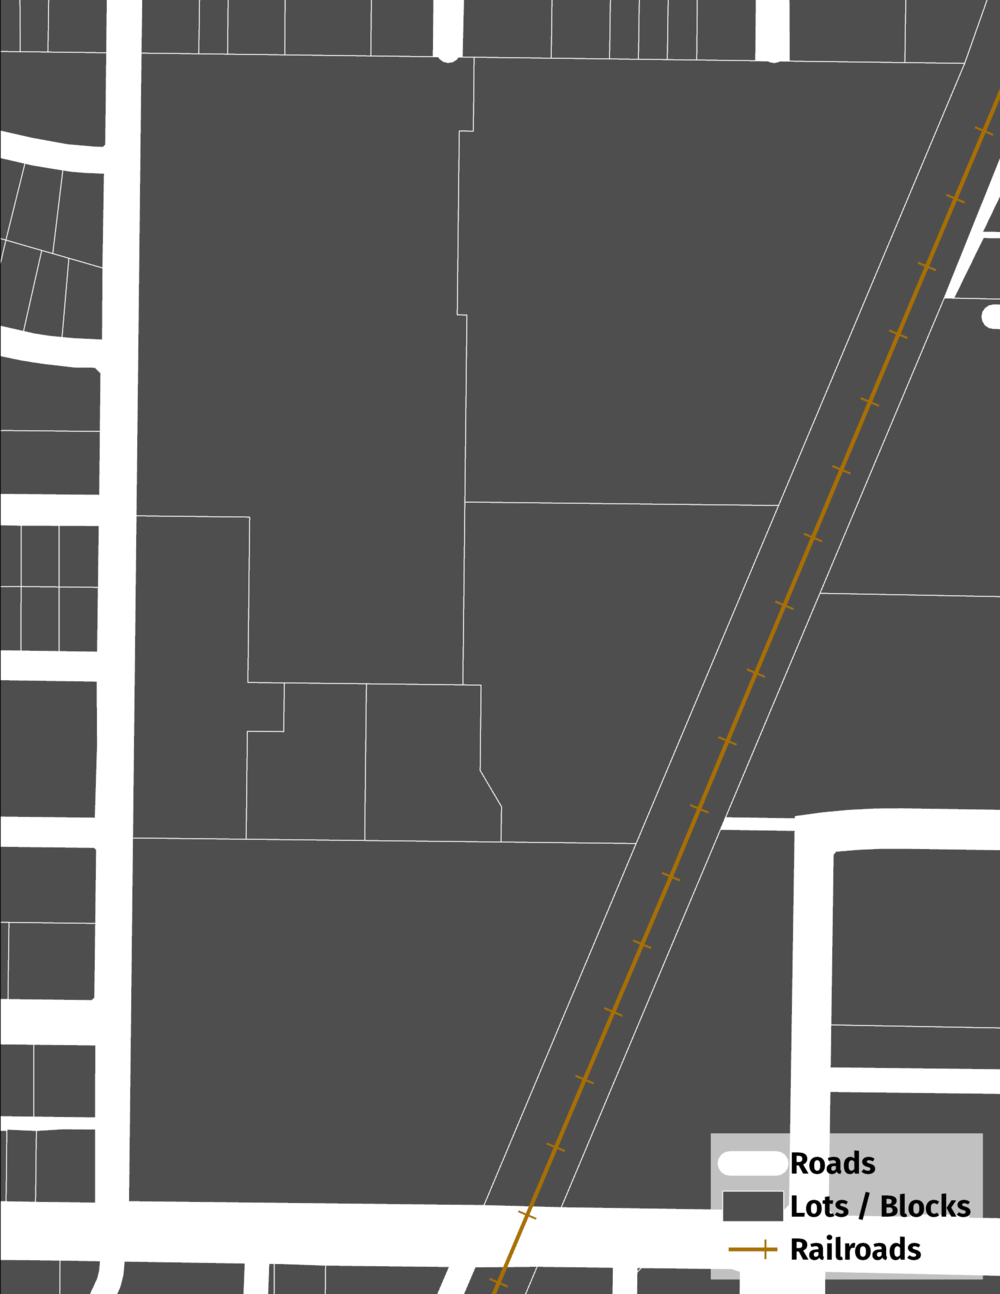 Figure 2. A simple breakdown of lots (or blocks) and roads.